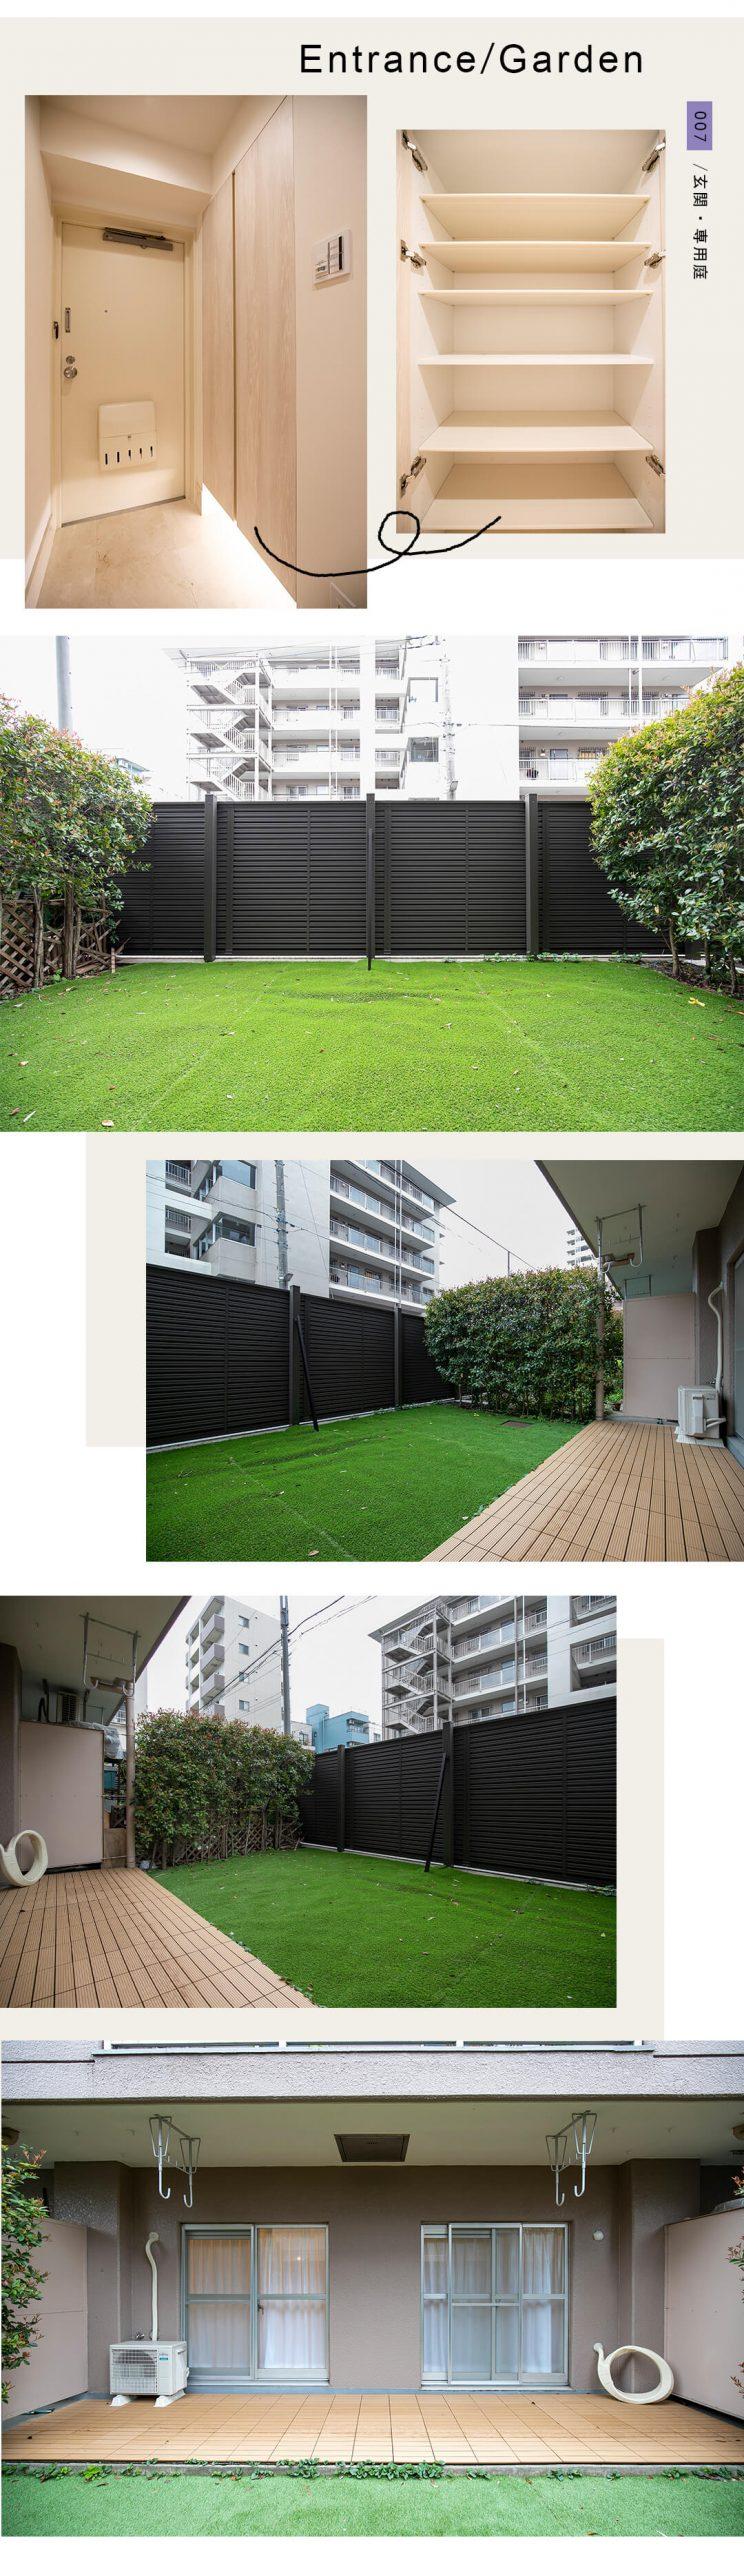 007玄関,専用庭,Entrance,Garden